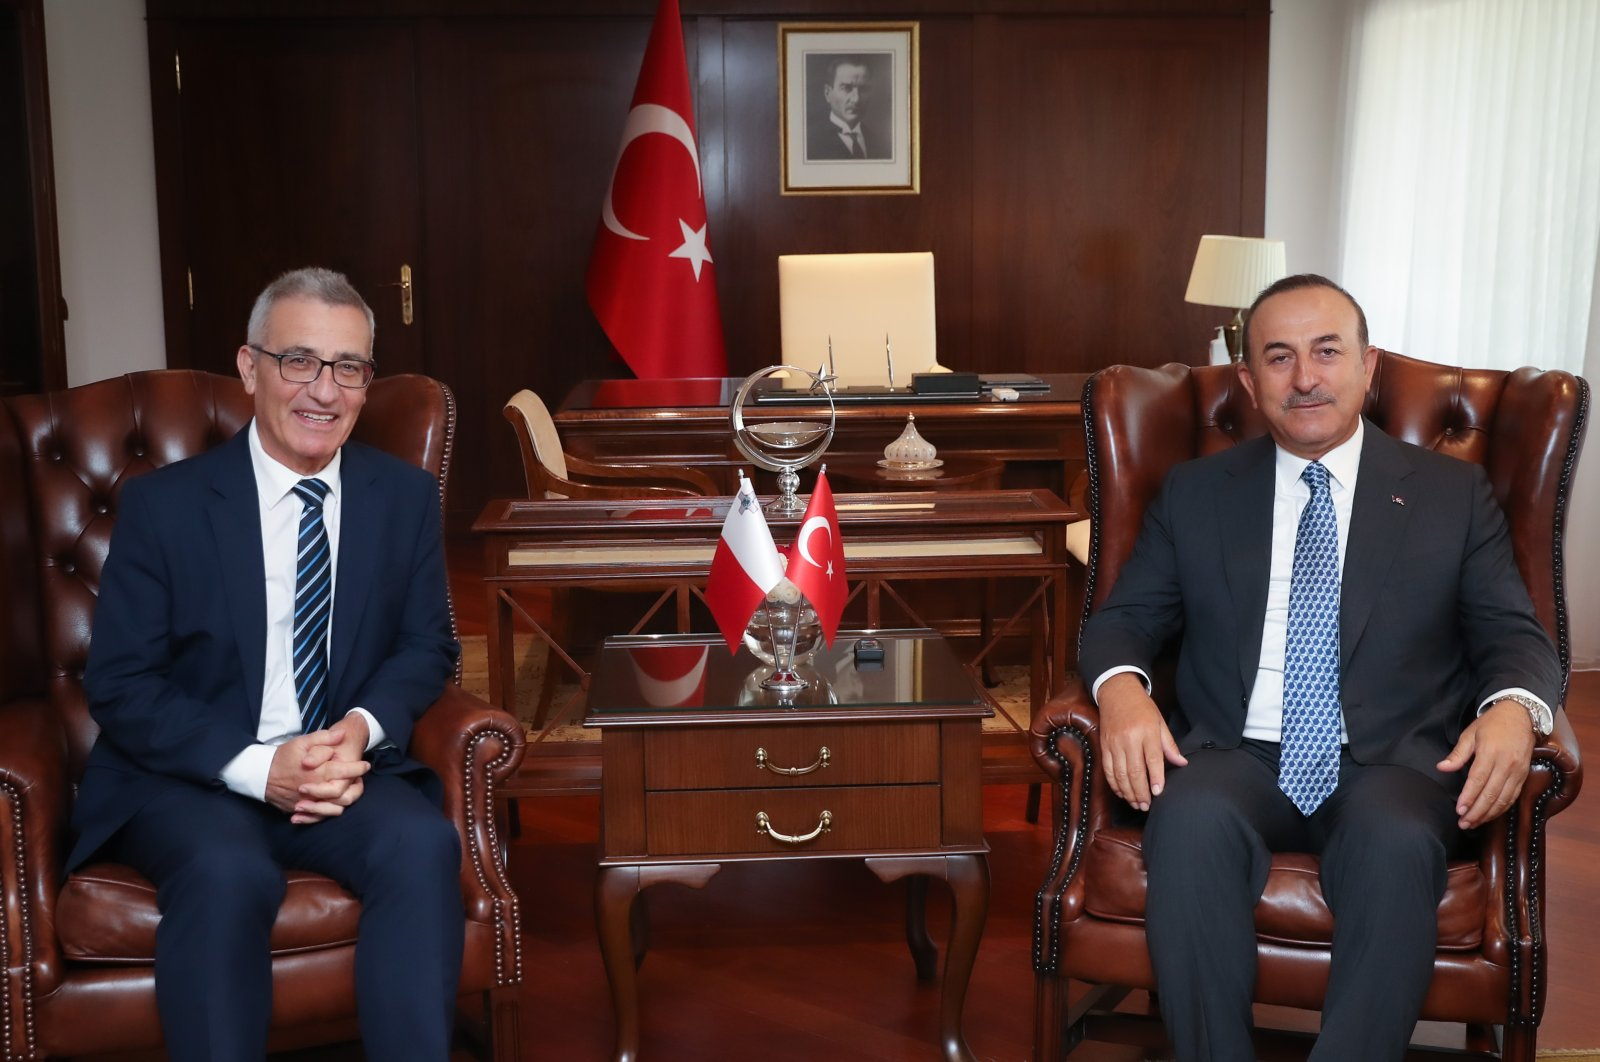 Foreign Minister Mevlüt Çavuşoğlu receives his Maltese counterpart Evarist Bartolo in the capital Ankara, Turkey, July 14, 2020. (AA Photo)